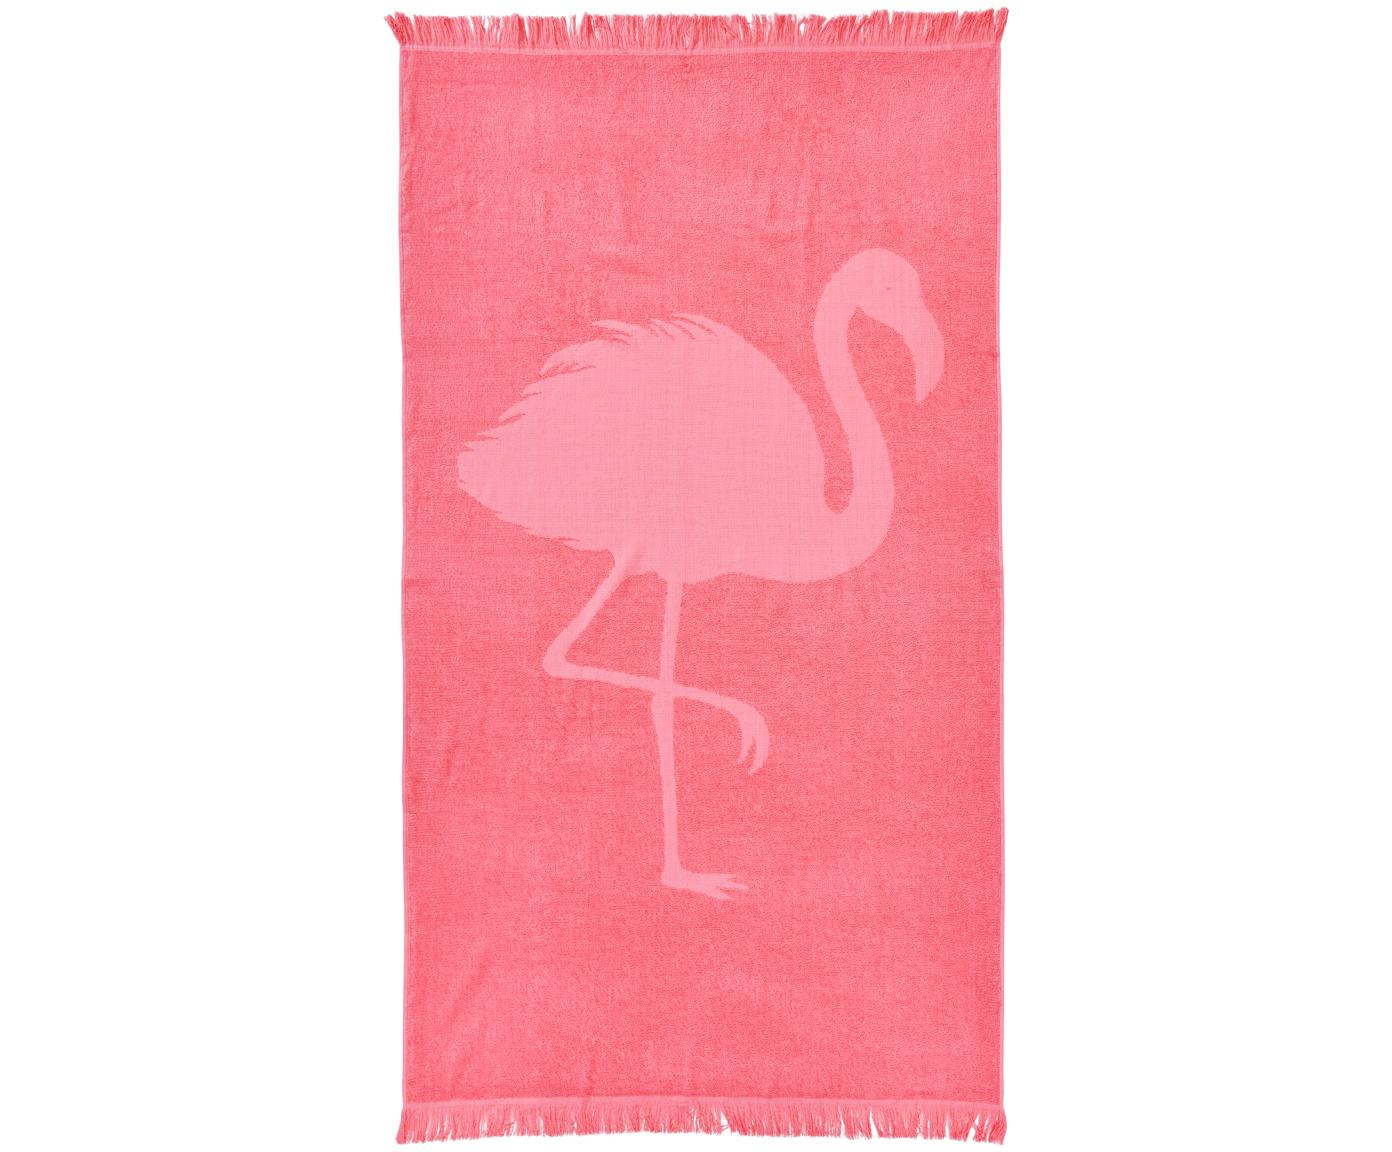 Telo mare in cotone Capri Flamingo, Rosa, Larg. 90 x Lung. 160 cm